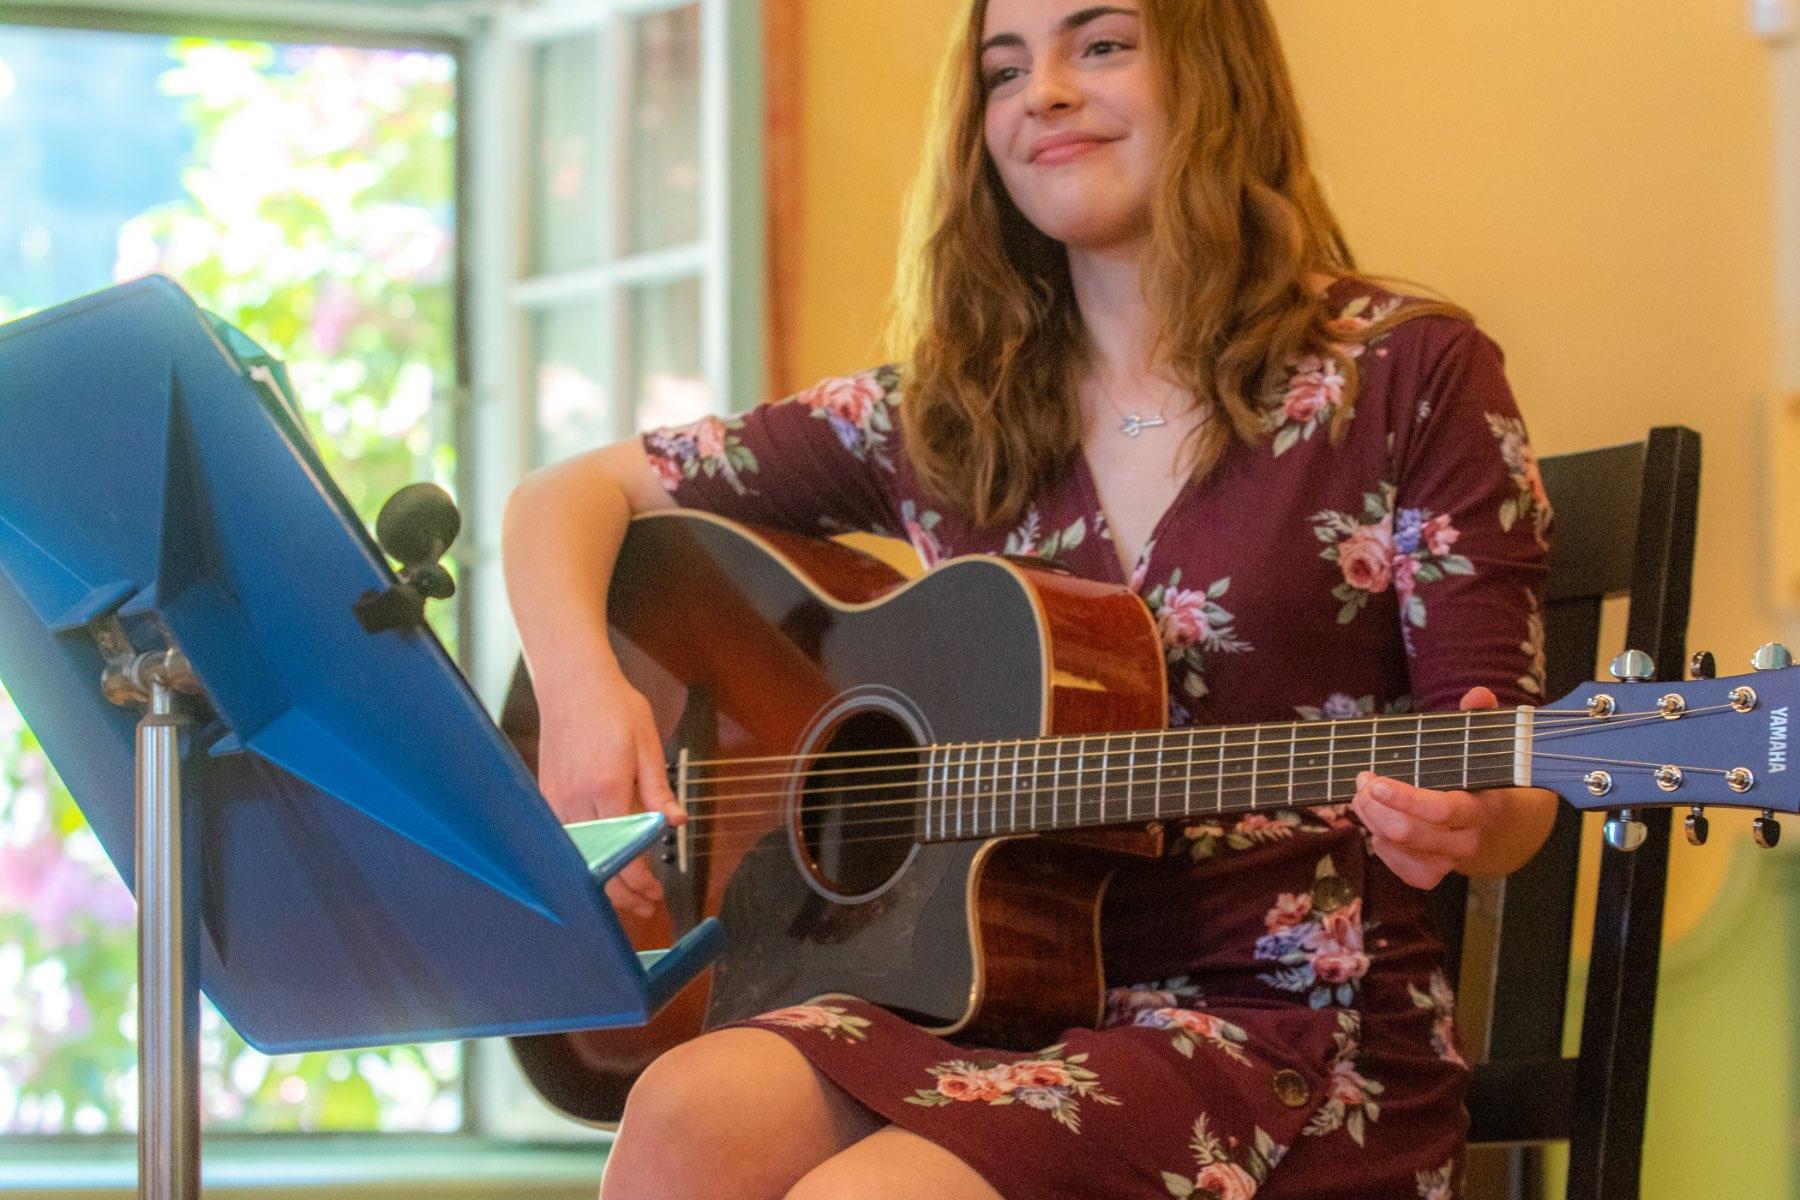 Student playing guitar, close up image.